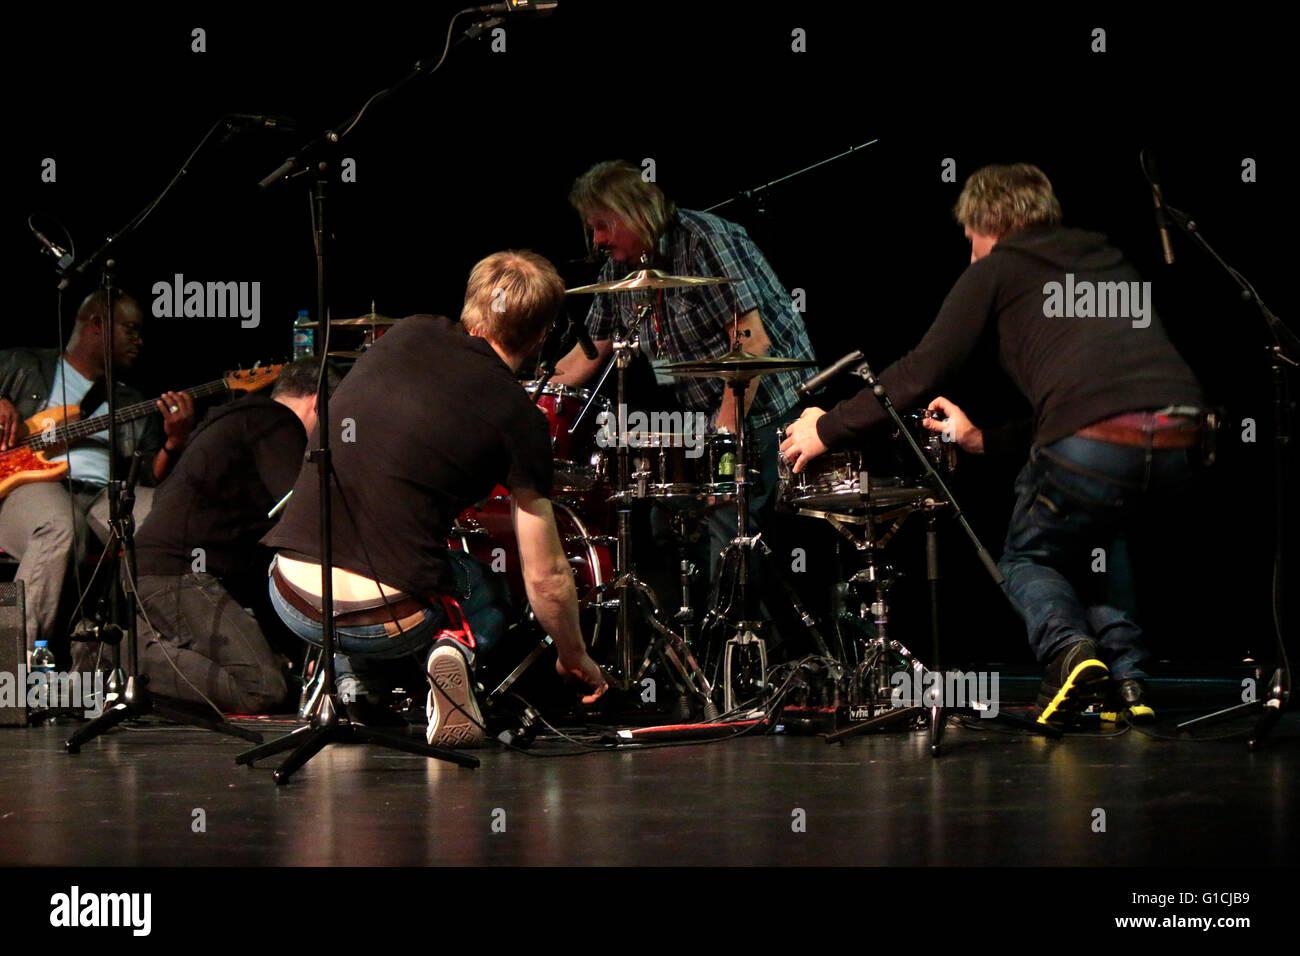 Impressionen - Jazzfest Berlin, 2. November 2014, Berlin. - Stock Image